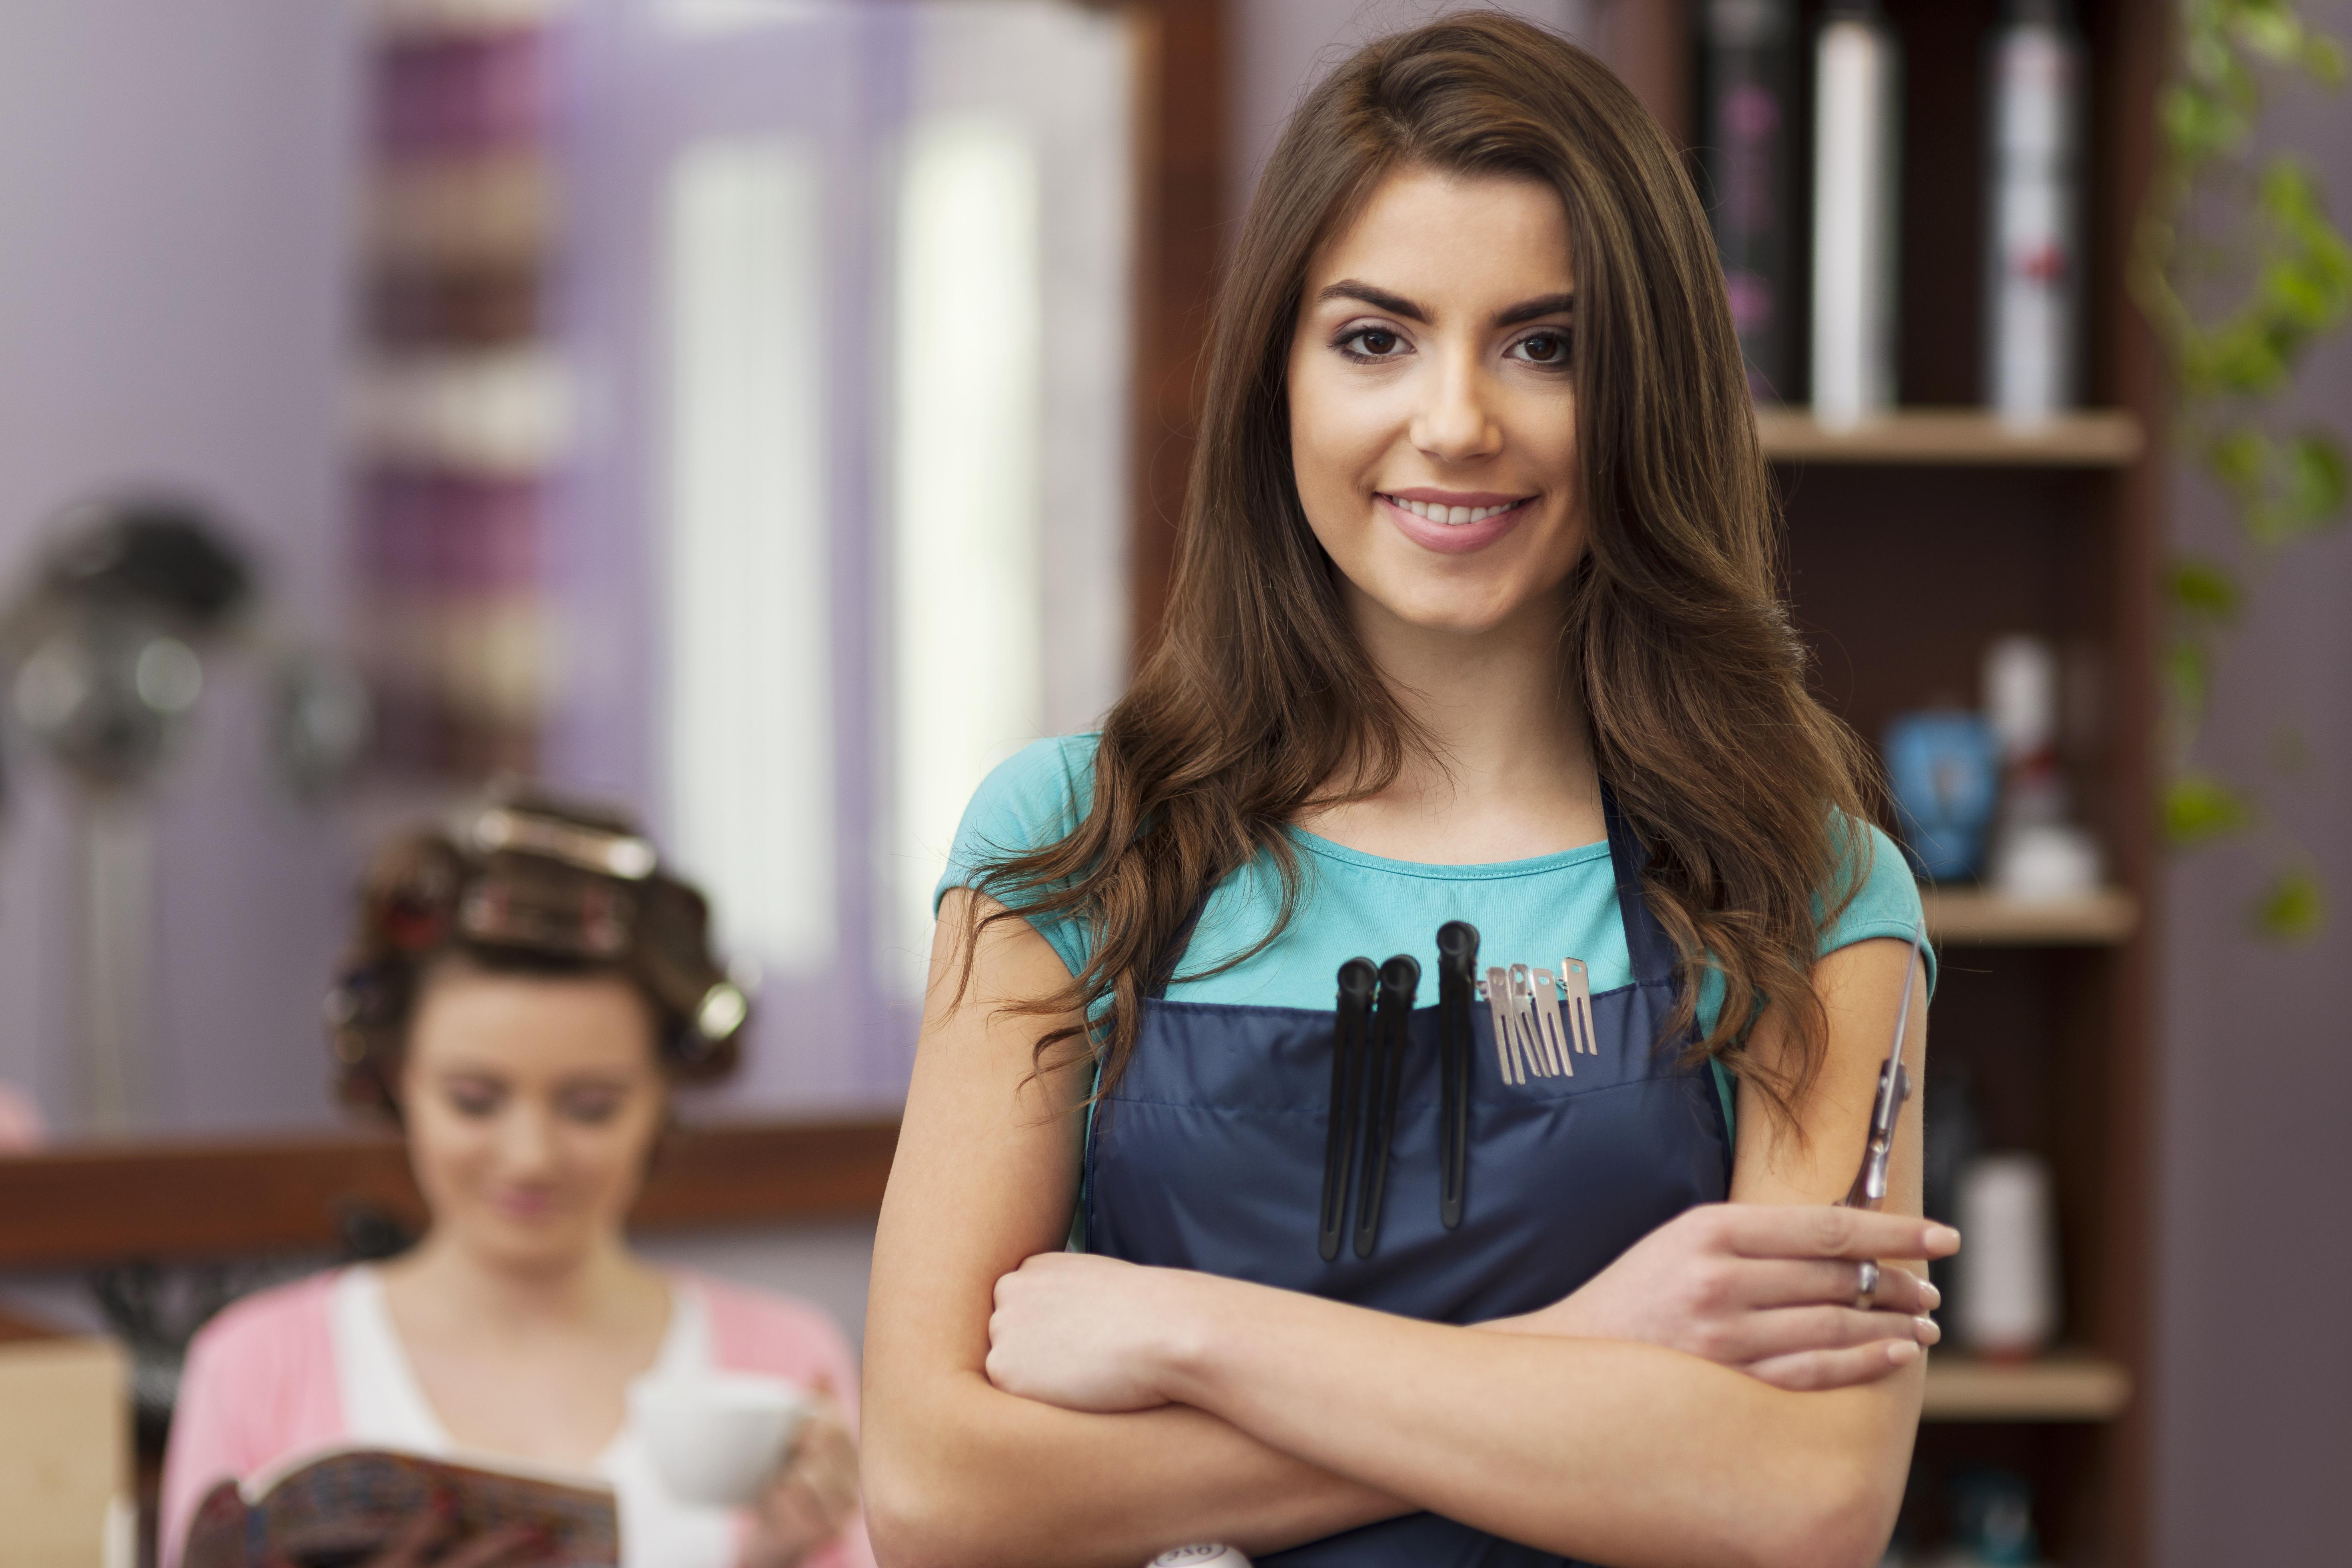 Oakleigh hair and beauty salon for sale